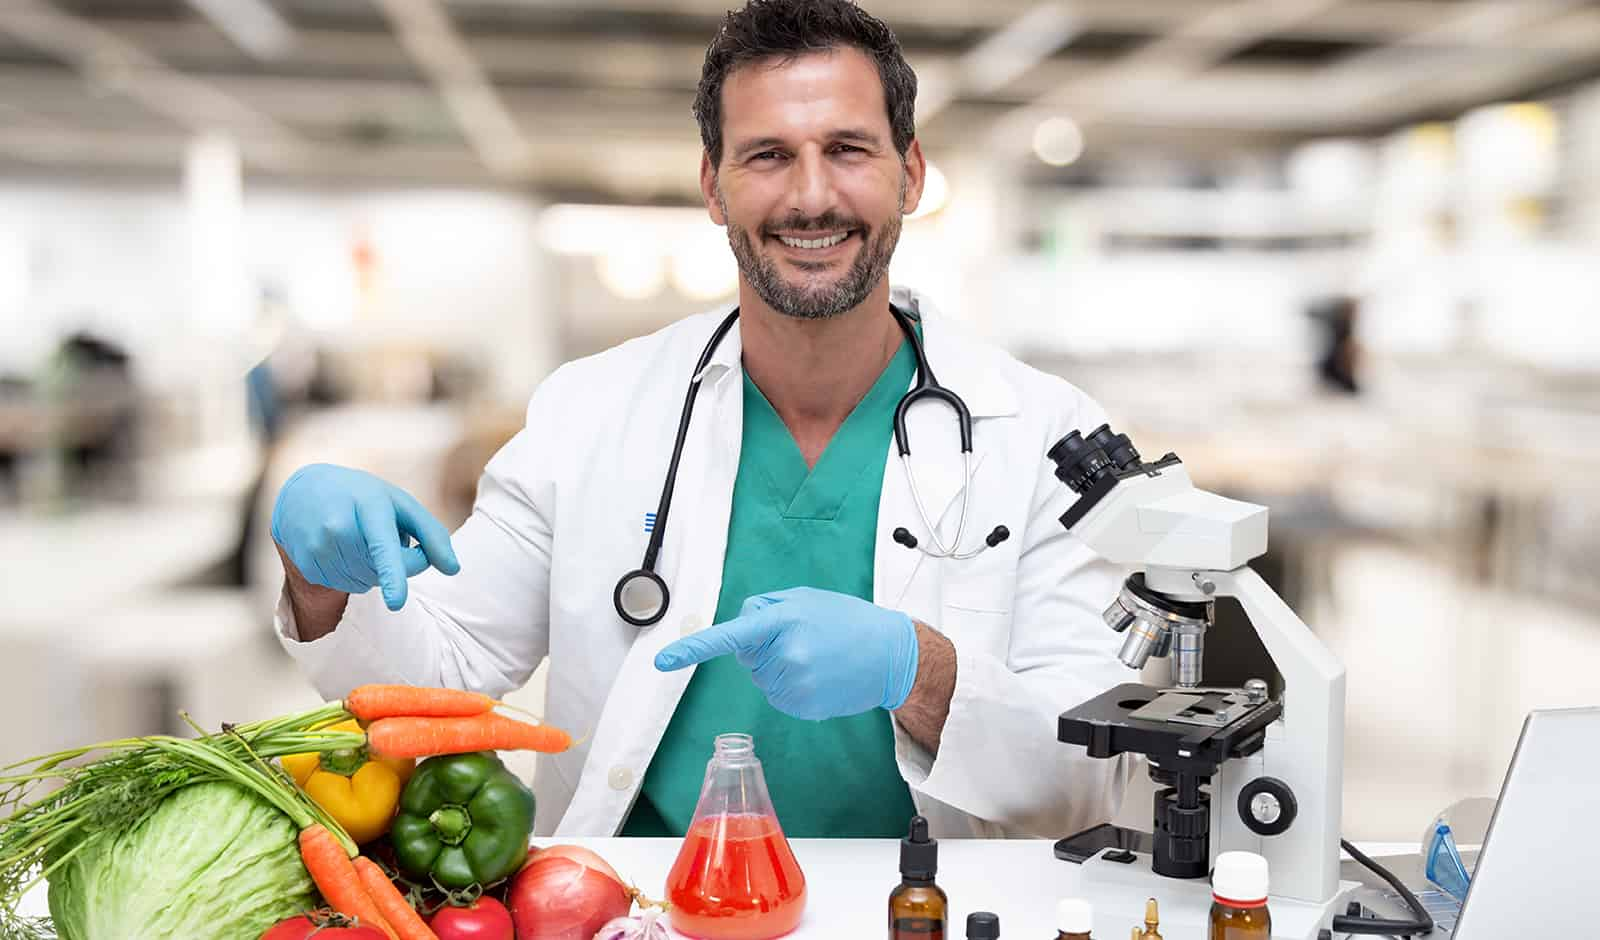 nfi-diet-reversing-type-2-diabetes-main-image